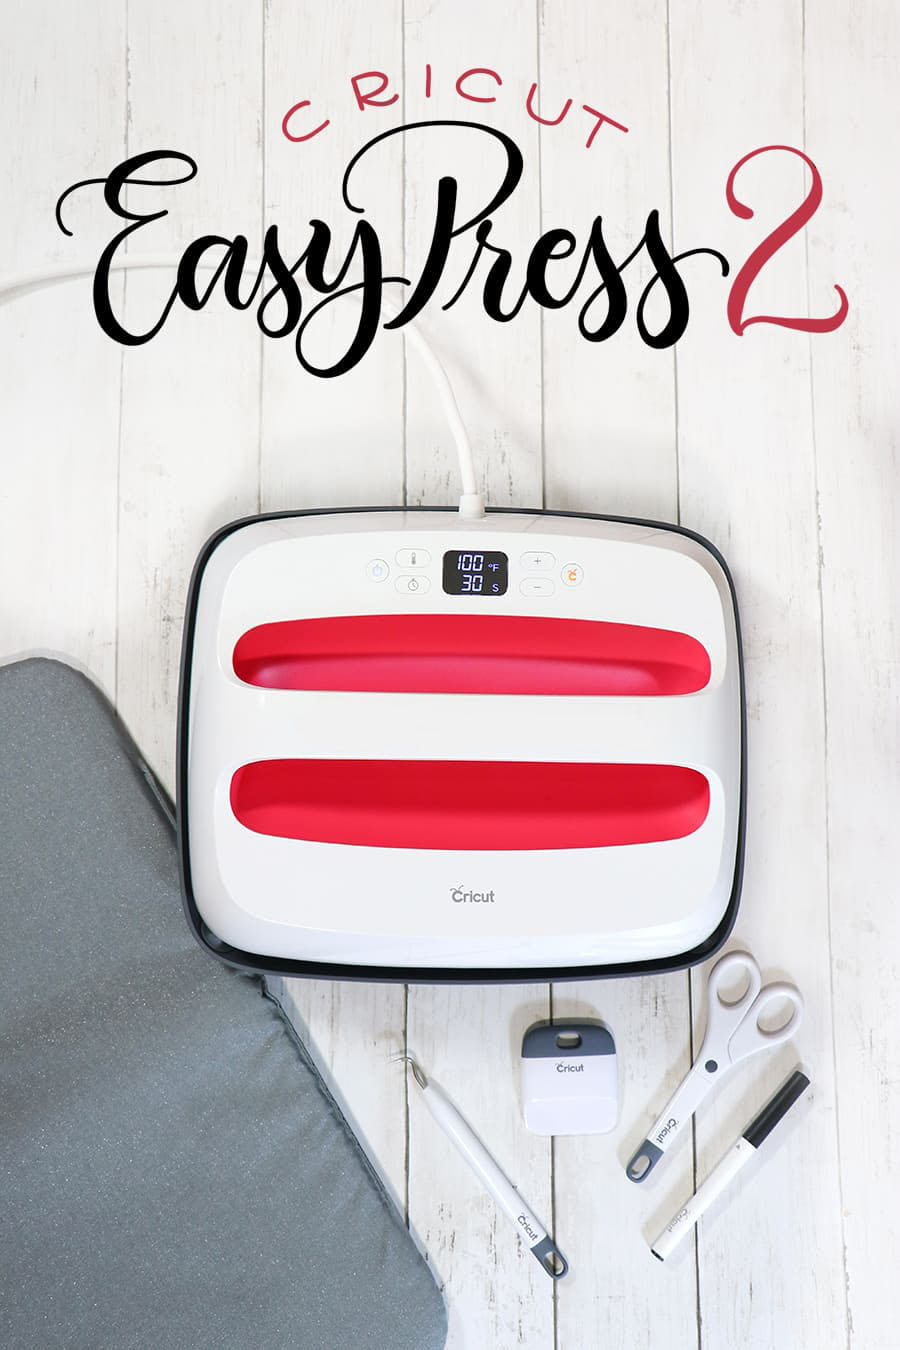 easypress 2 craft